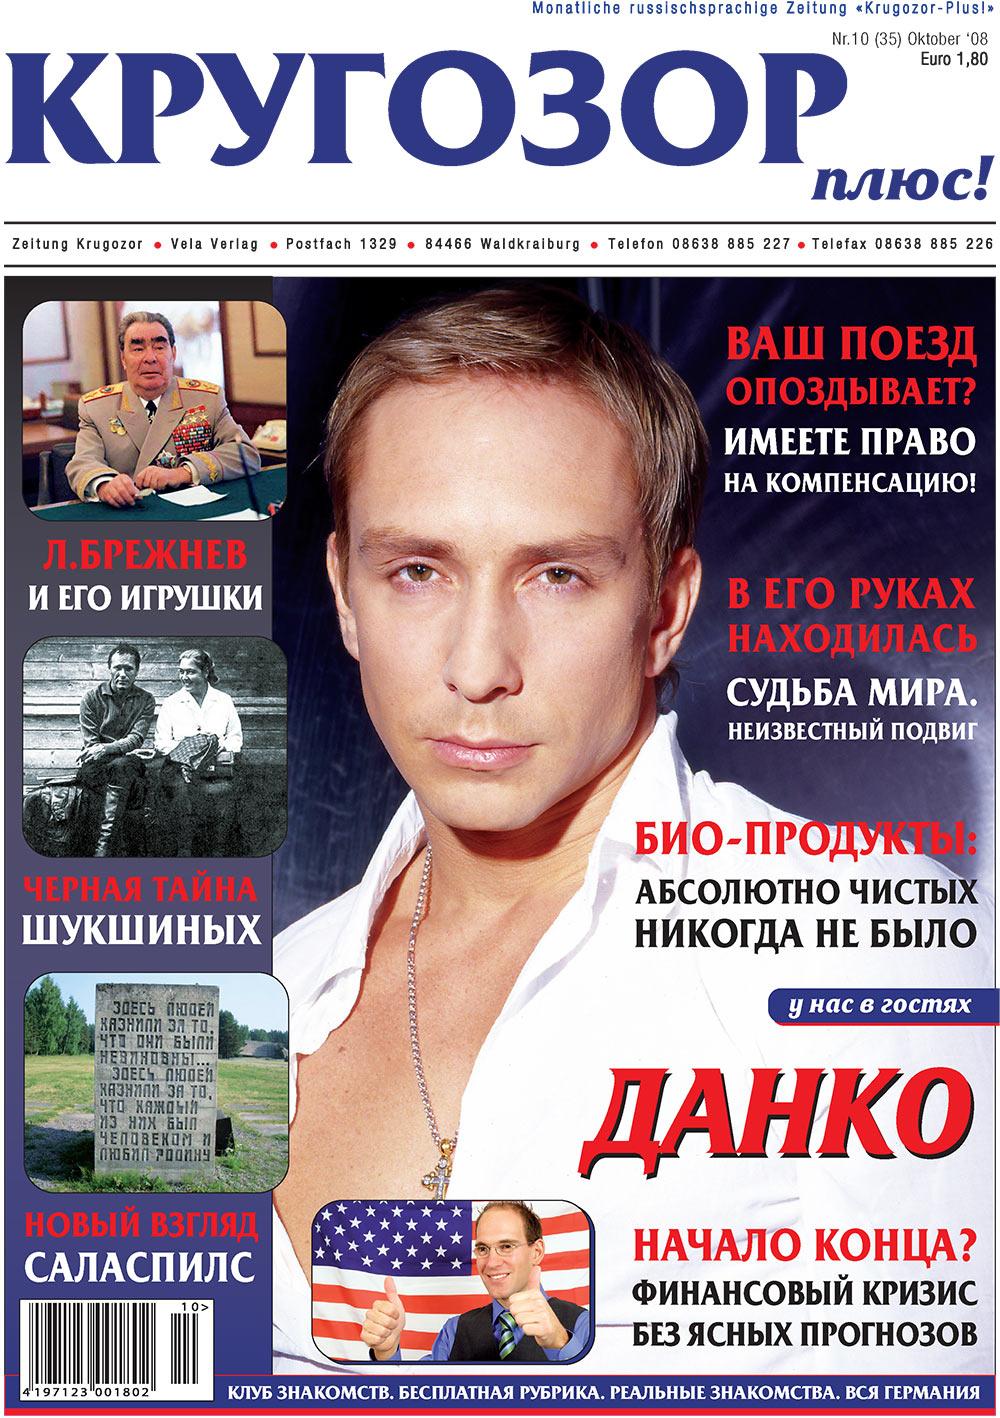 Кругозор плюс! (газета). 2008 год, номер 10, стр. 1